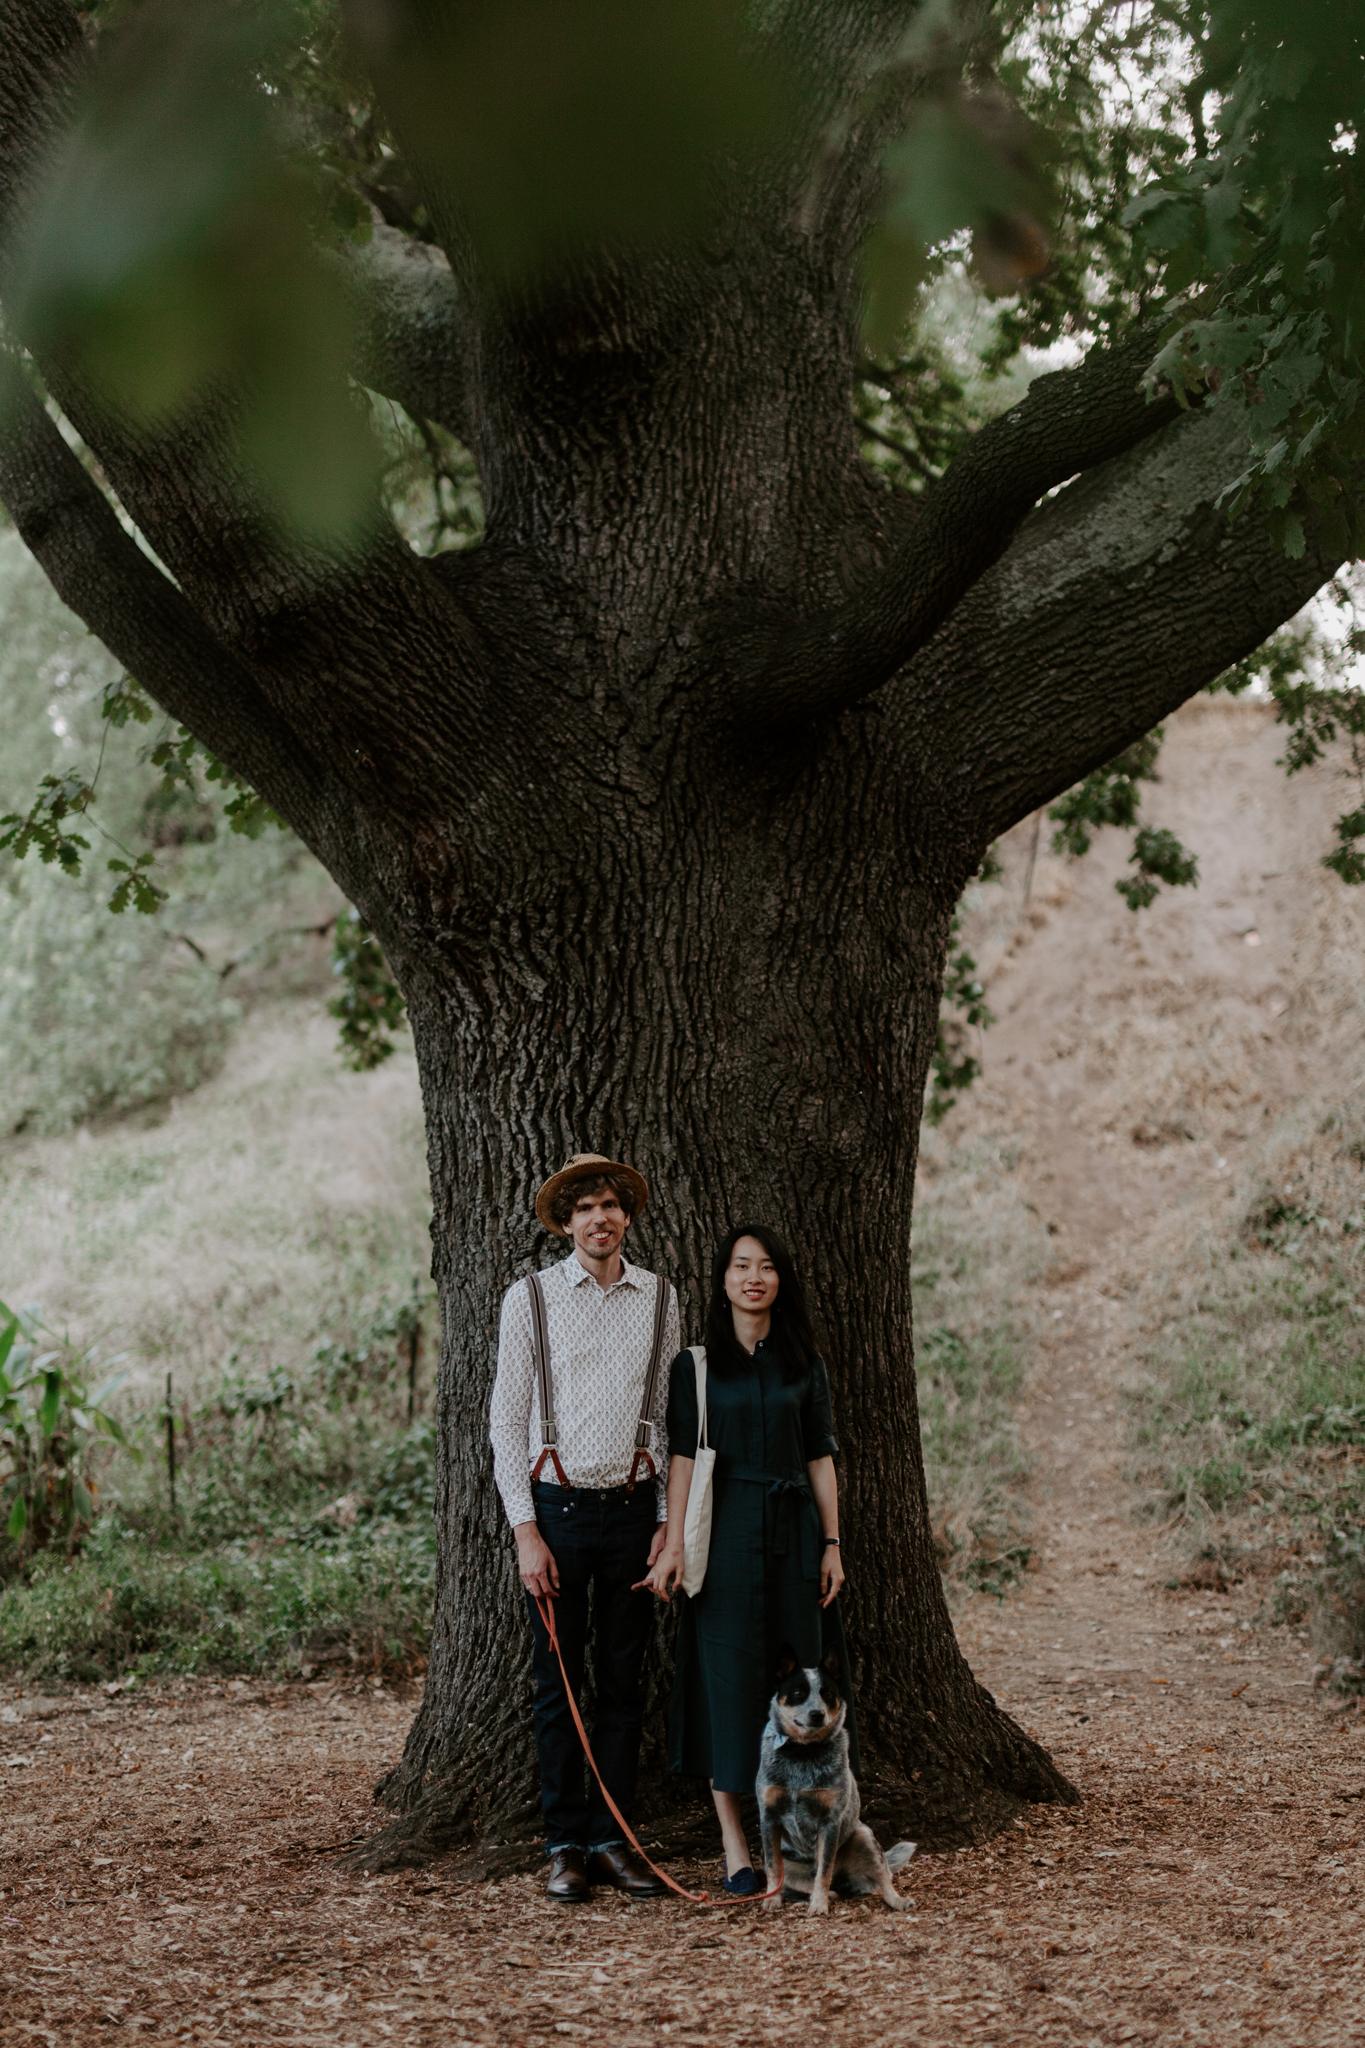 Abbotsford-Convent-couple-session-editorial-EmotionsandMath-050.jpg